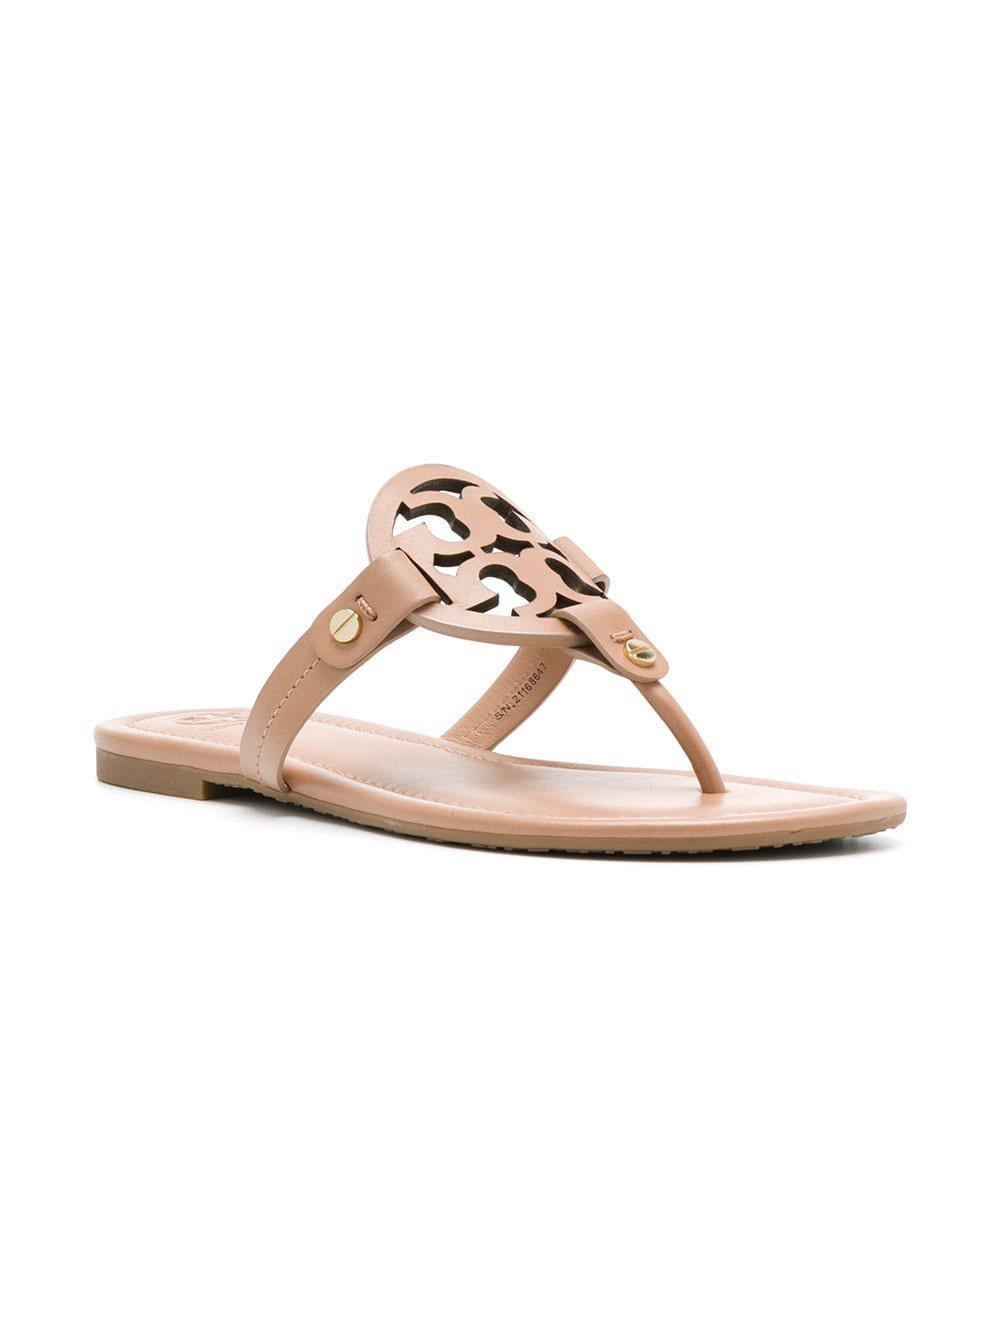 96e71294c2f0 Tory Burch Miller Sandals - Lyst